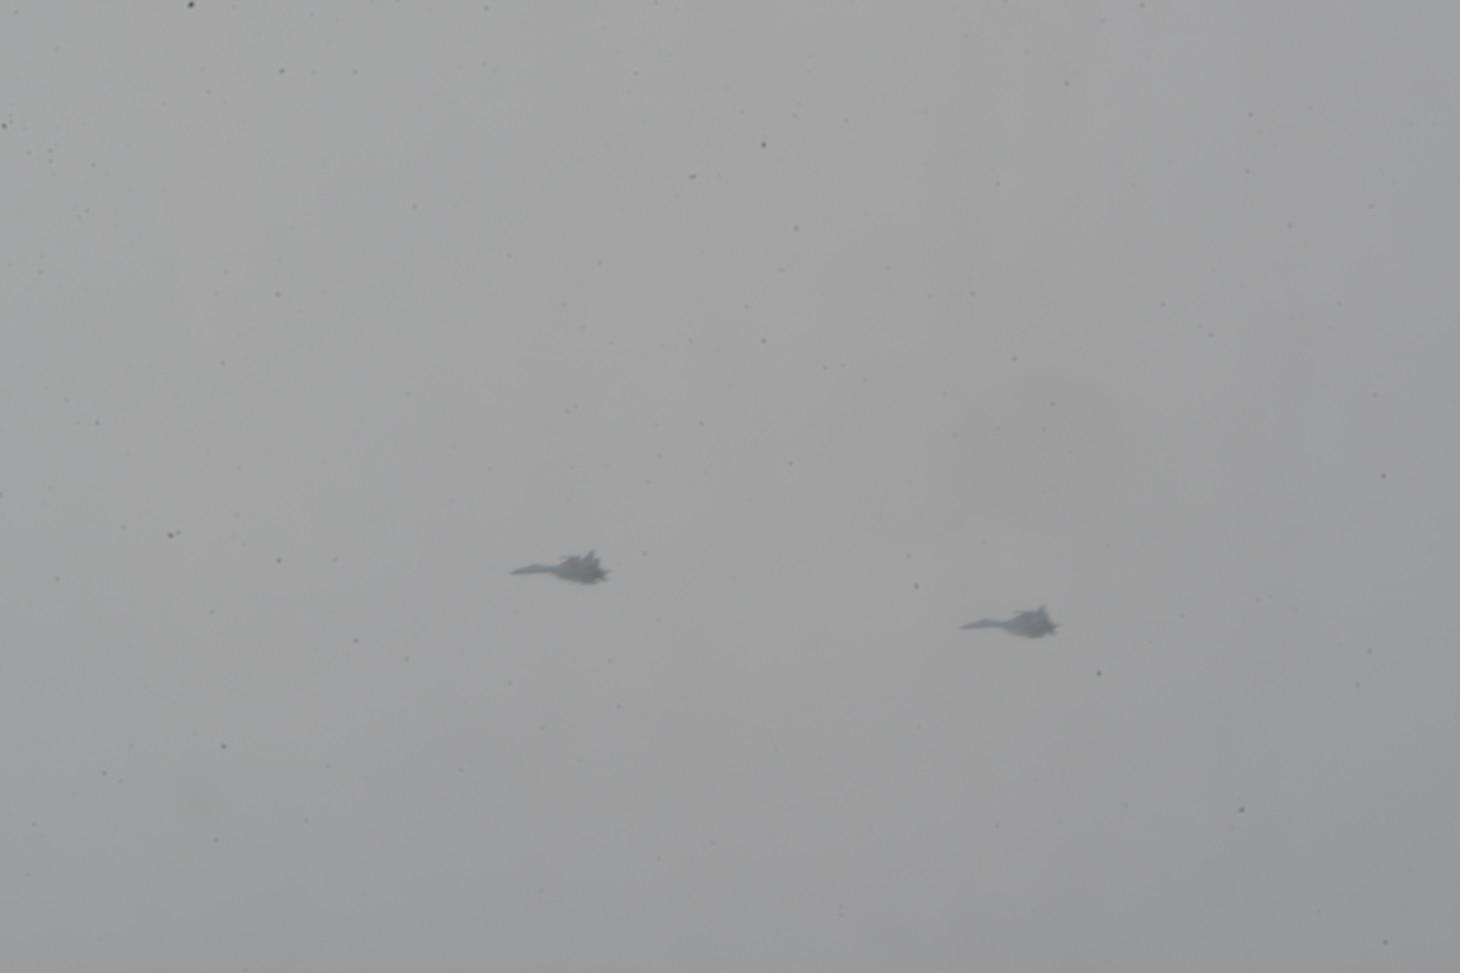 U.S. 6th Fleet